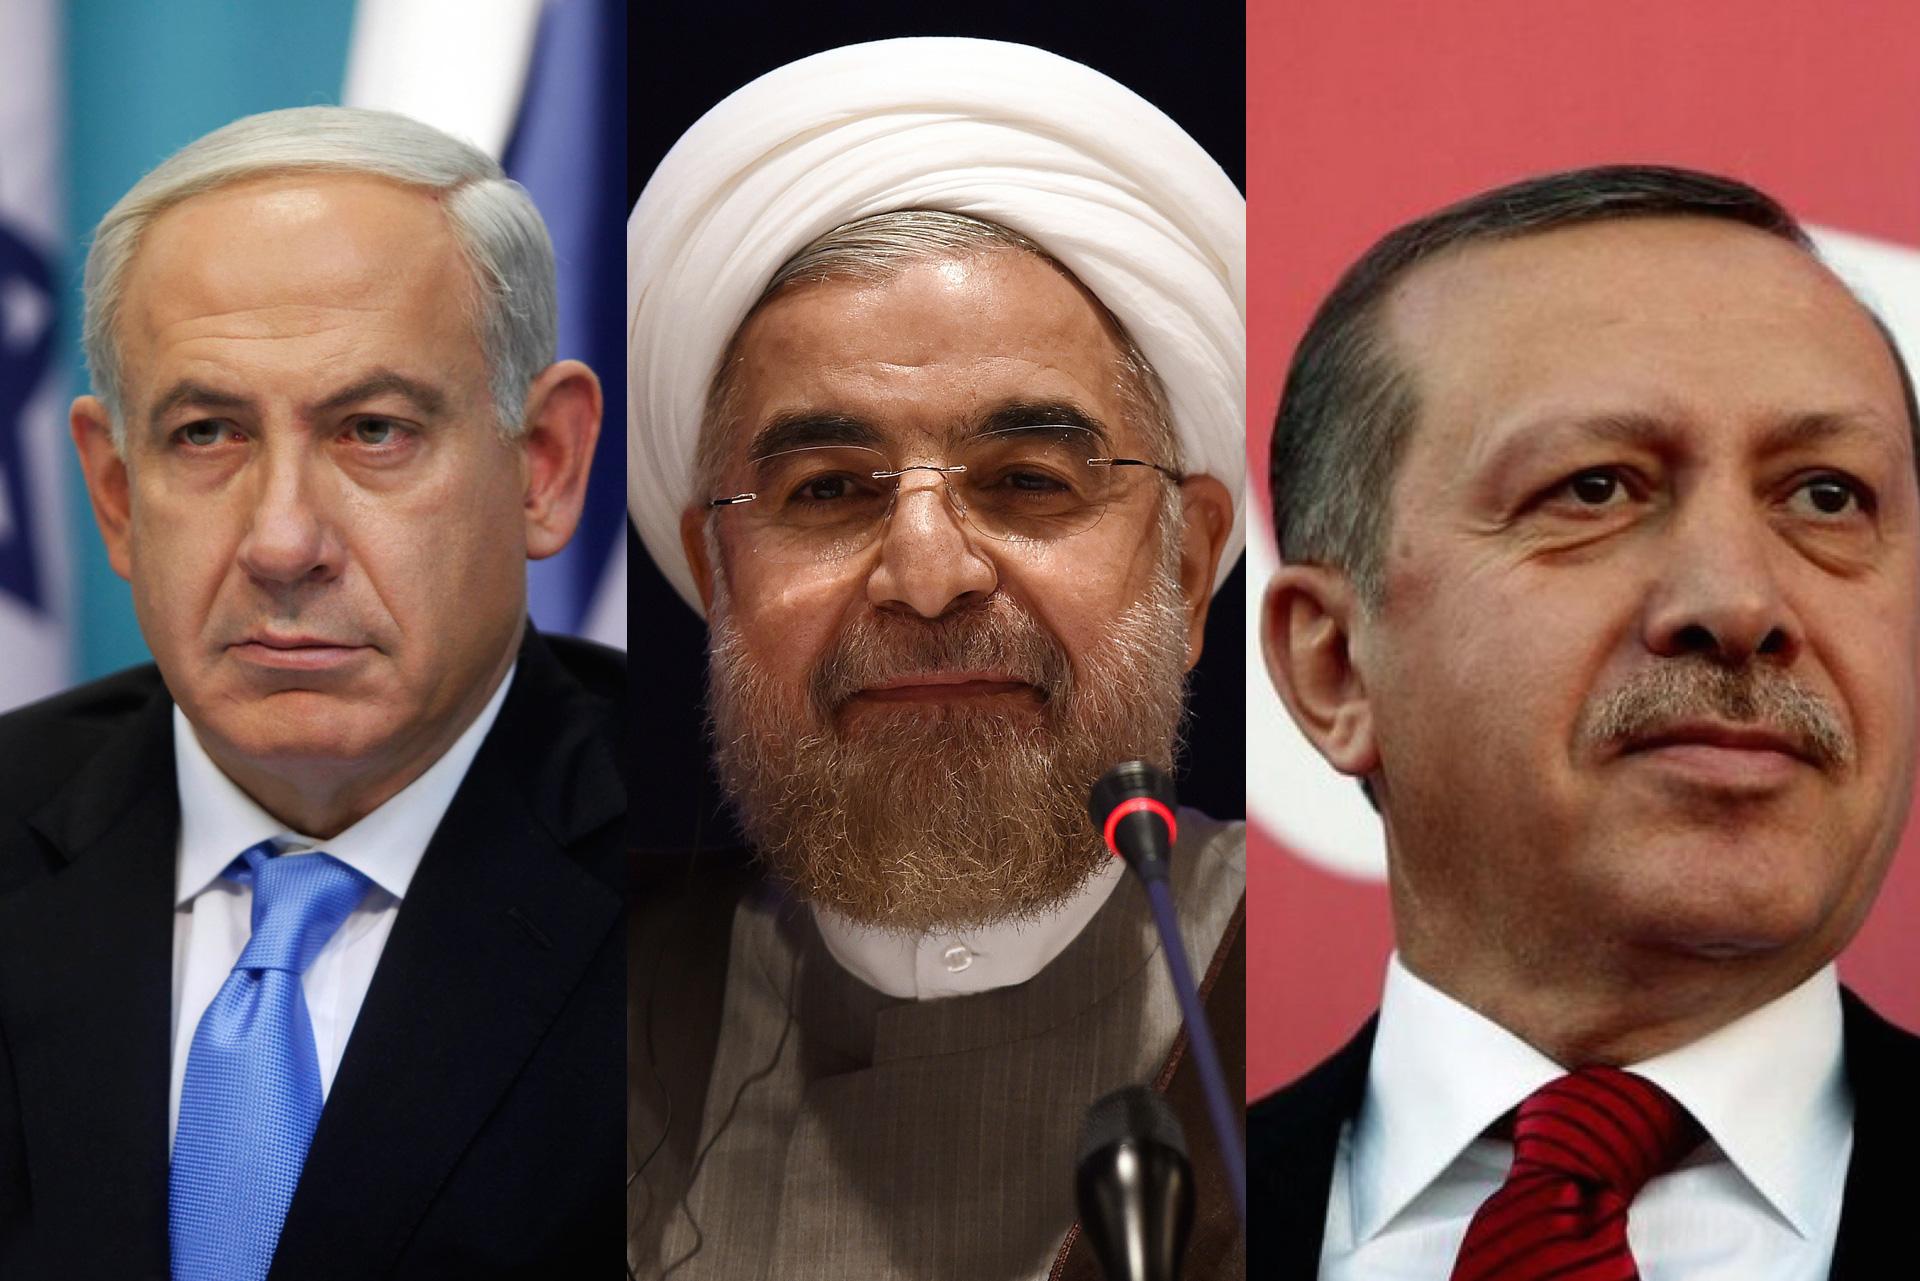 Israel's Prime Minster Benjamin Netanyahu (left), Iran's President Hassan Rouhani (middle) and Turkey's President Recep Tayyip Erdoğan (right) – @ MPC Journal.